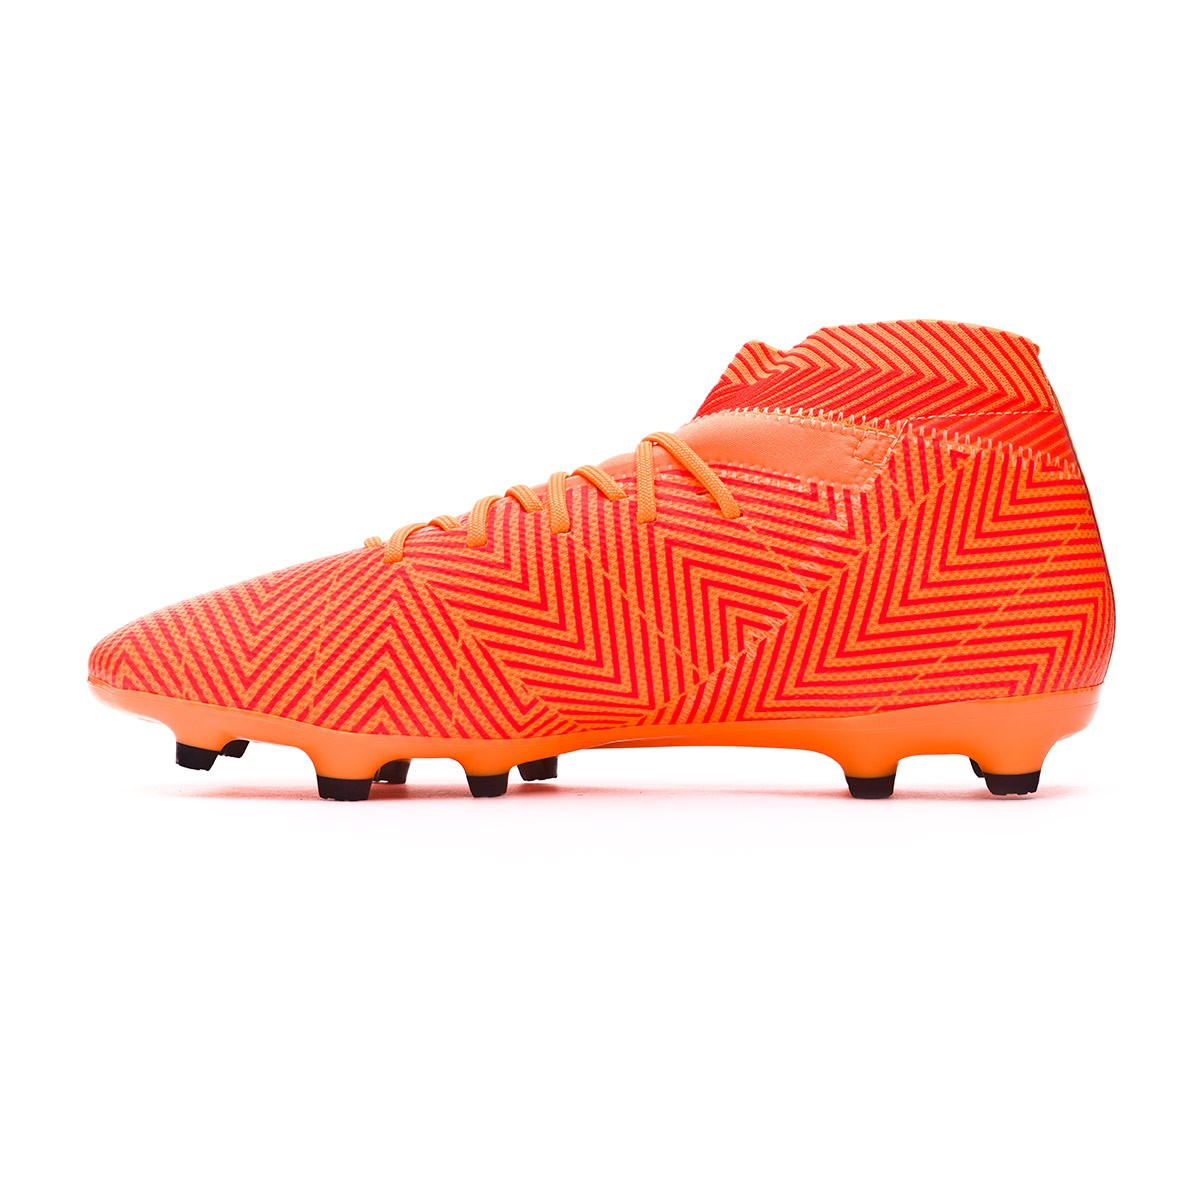 Red Black Solar Foot Fg Adidas Chaussure 3 18 De Zest Nemeziz DIWH2YE9